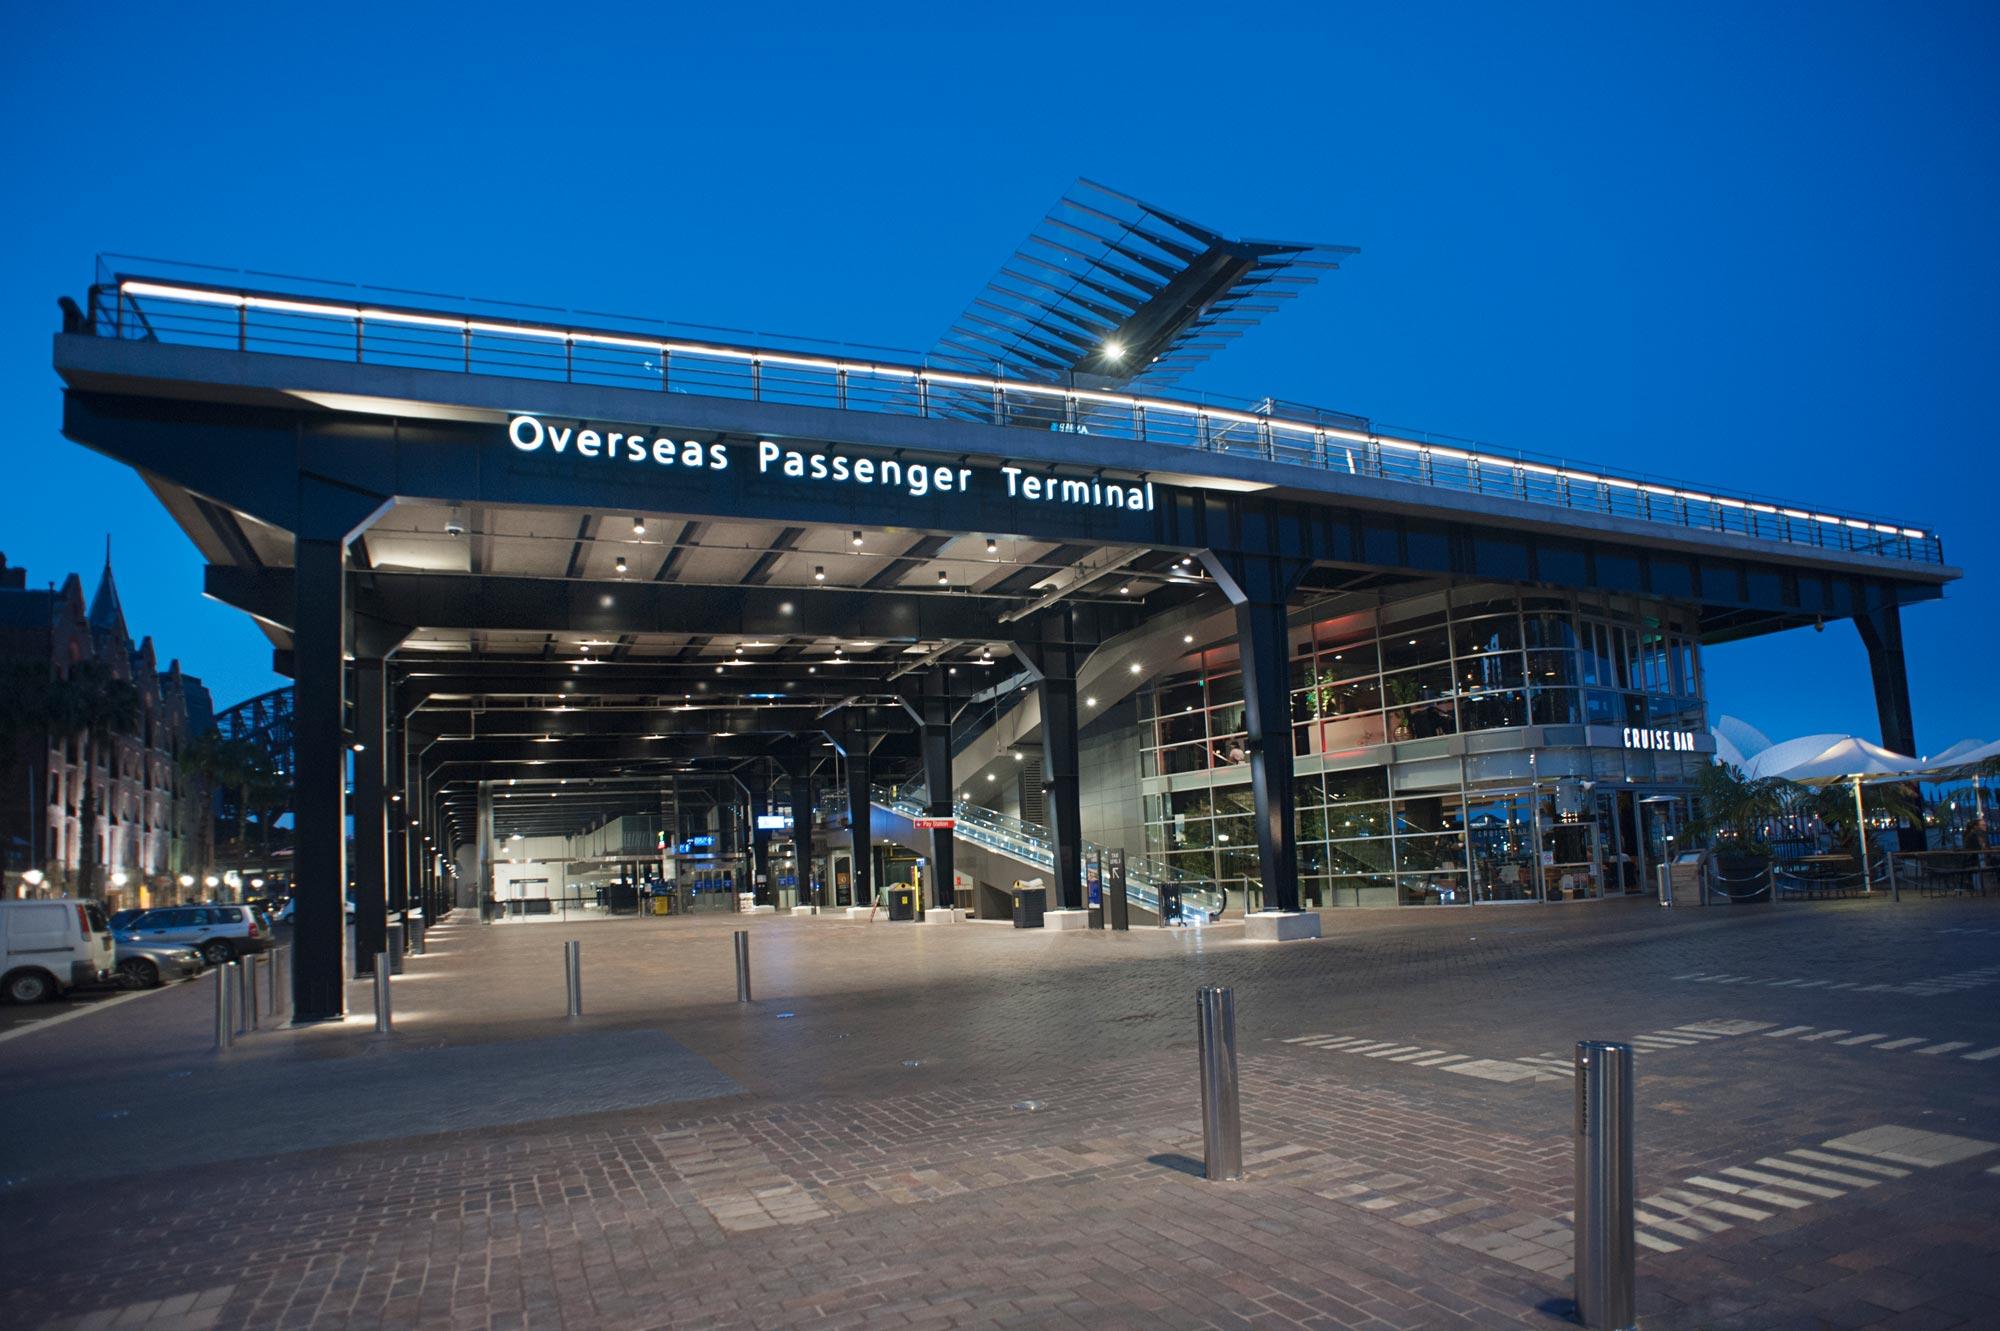 Overseas passenger terminal 00004